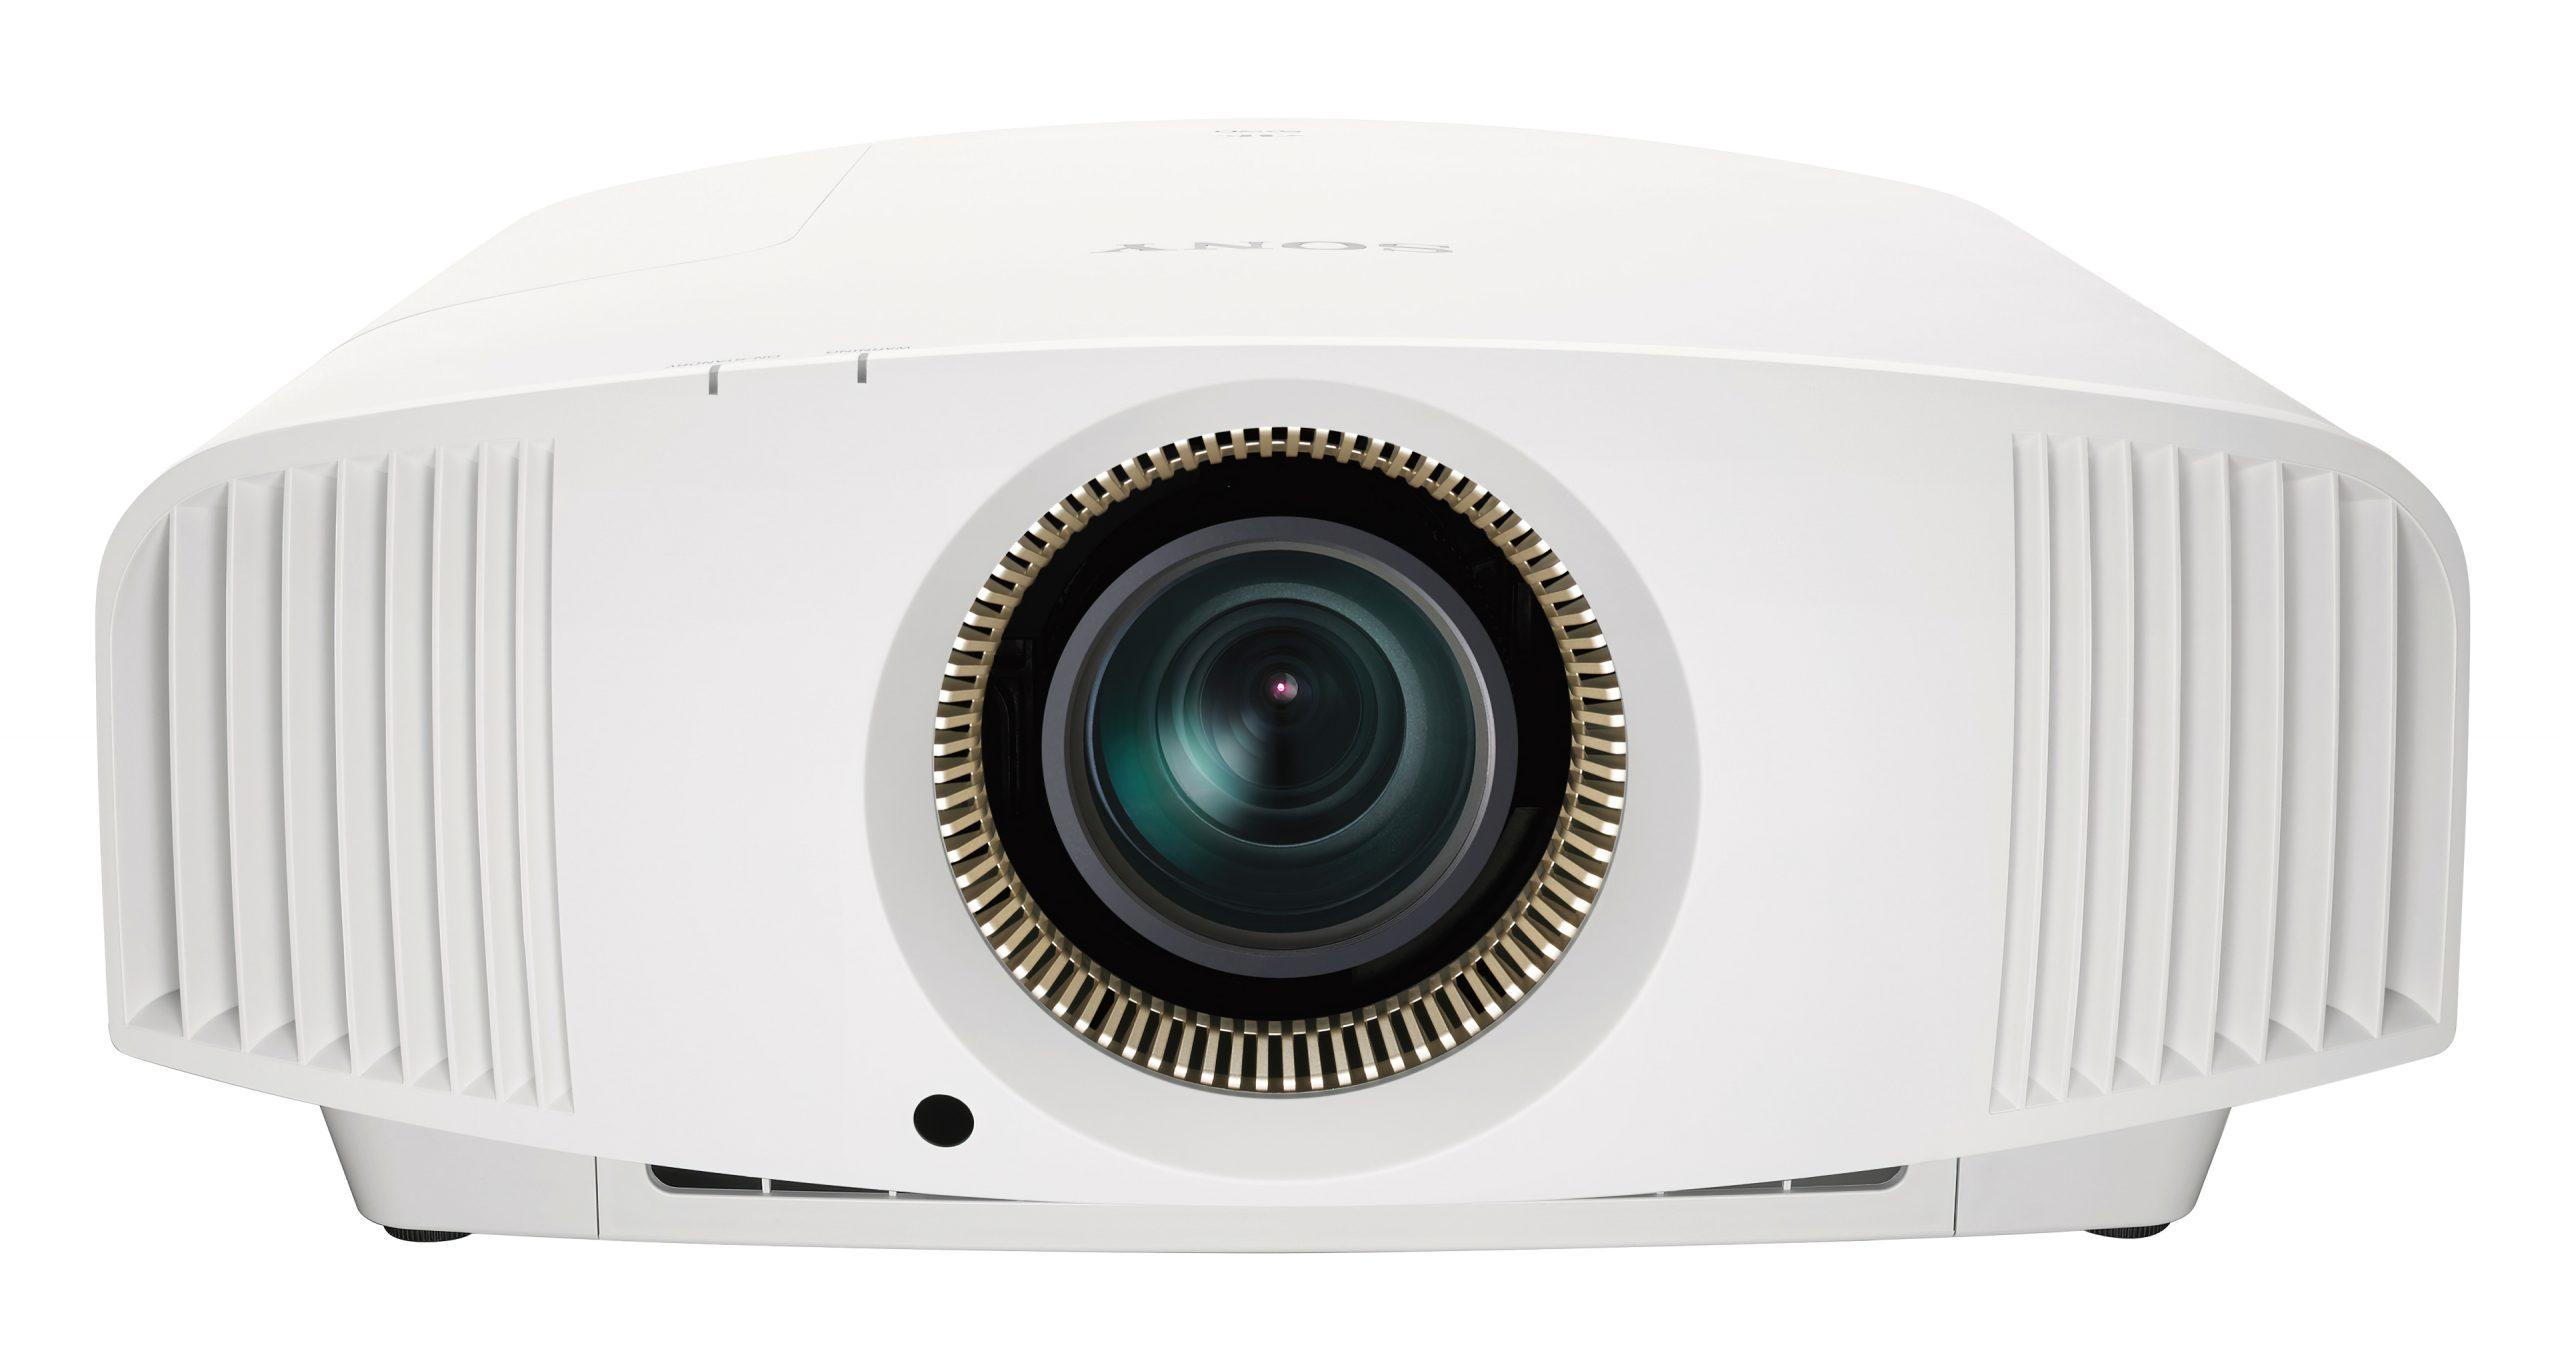 sony vpl-vw590es front white